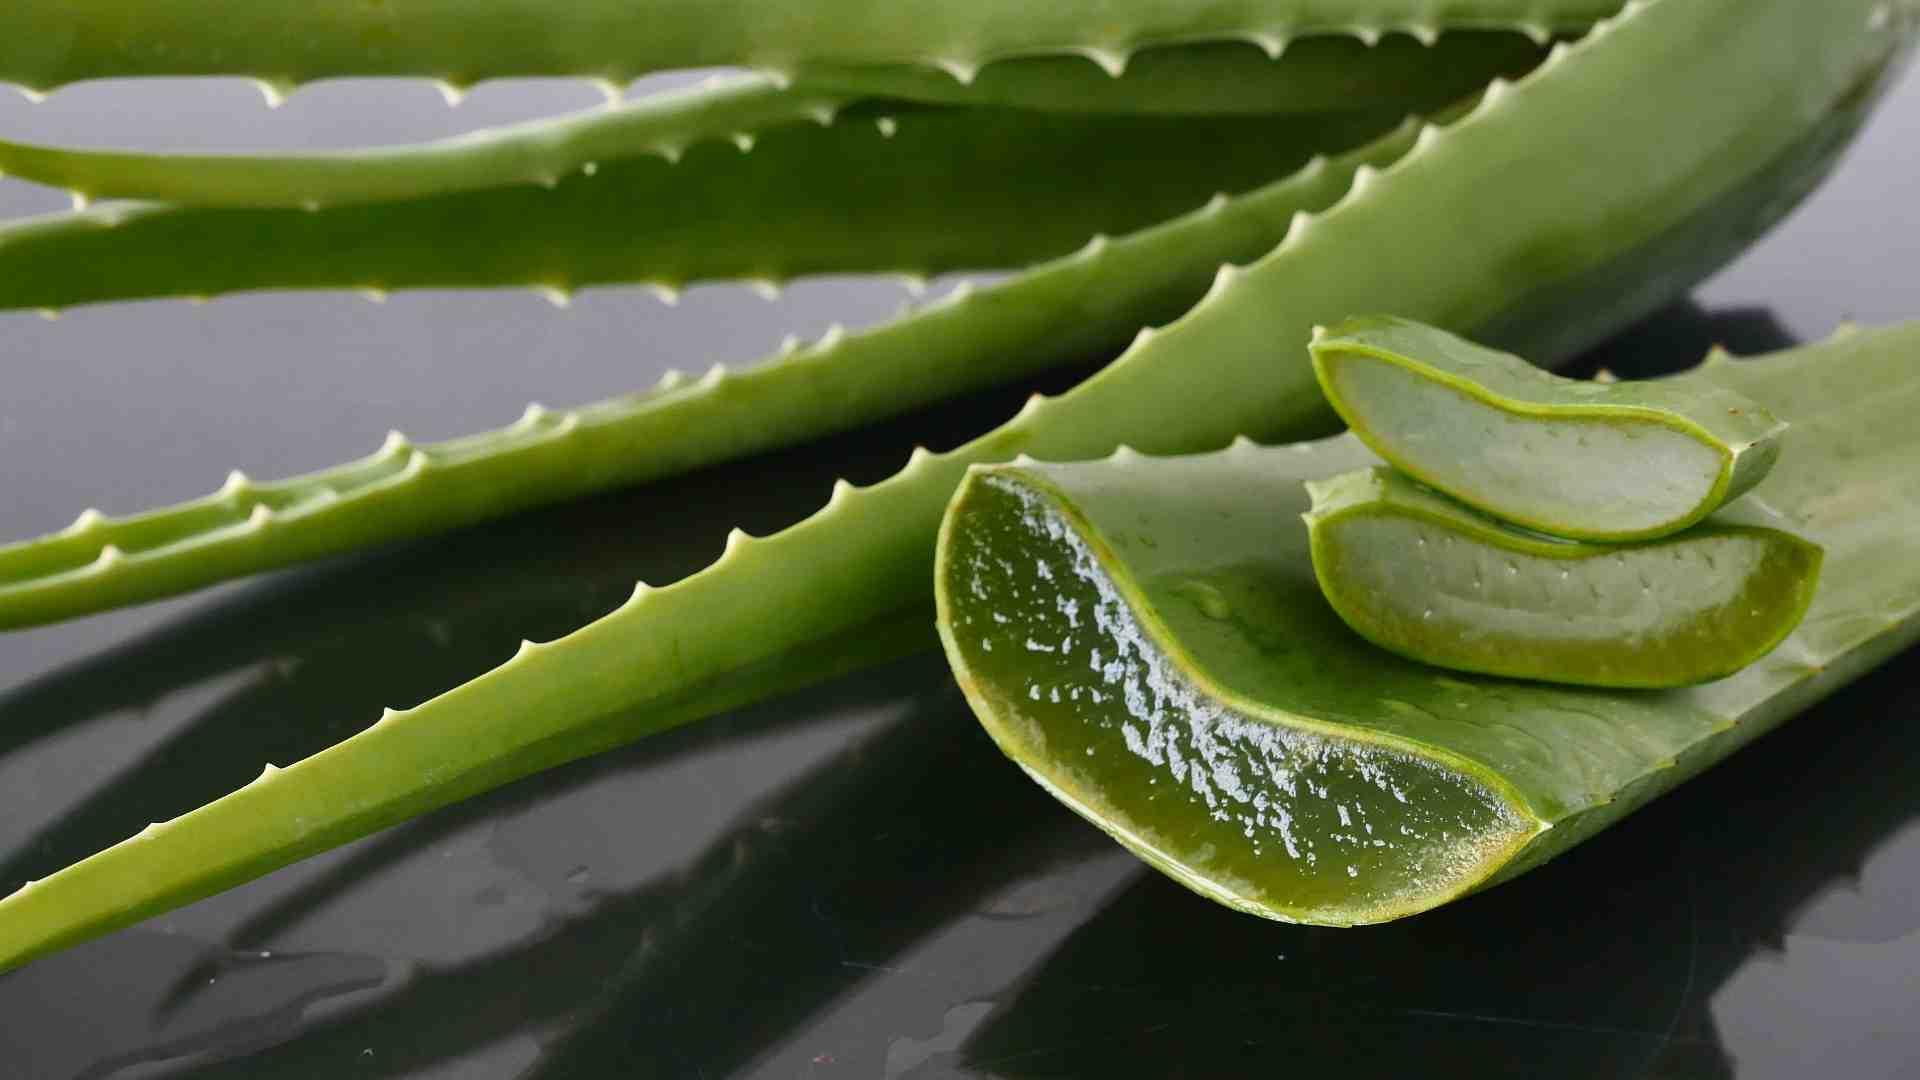 Benefits of Ayurvedic Aloe vera gel